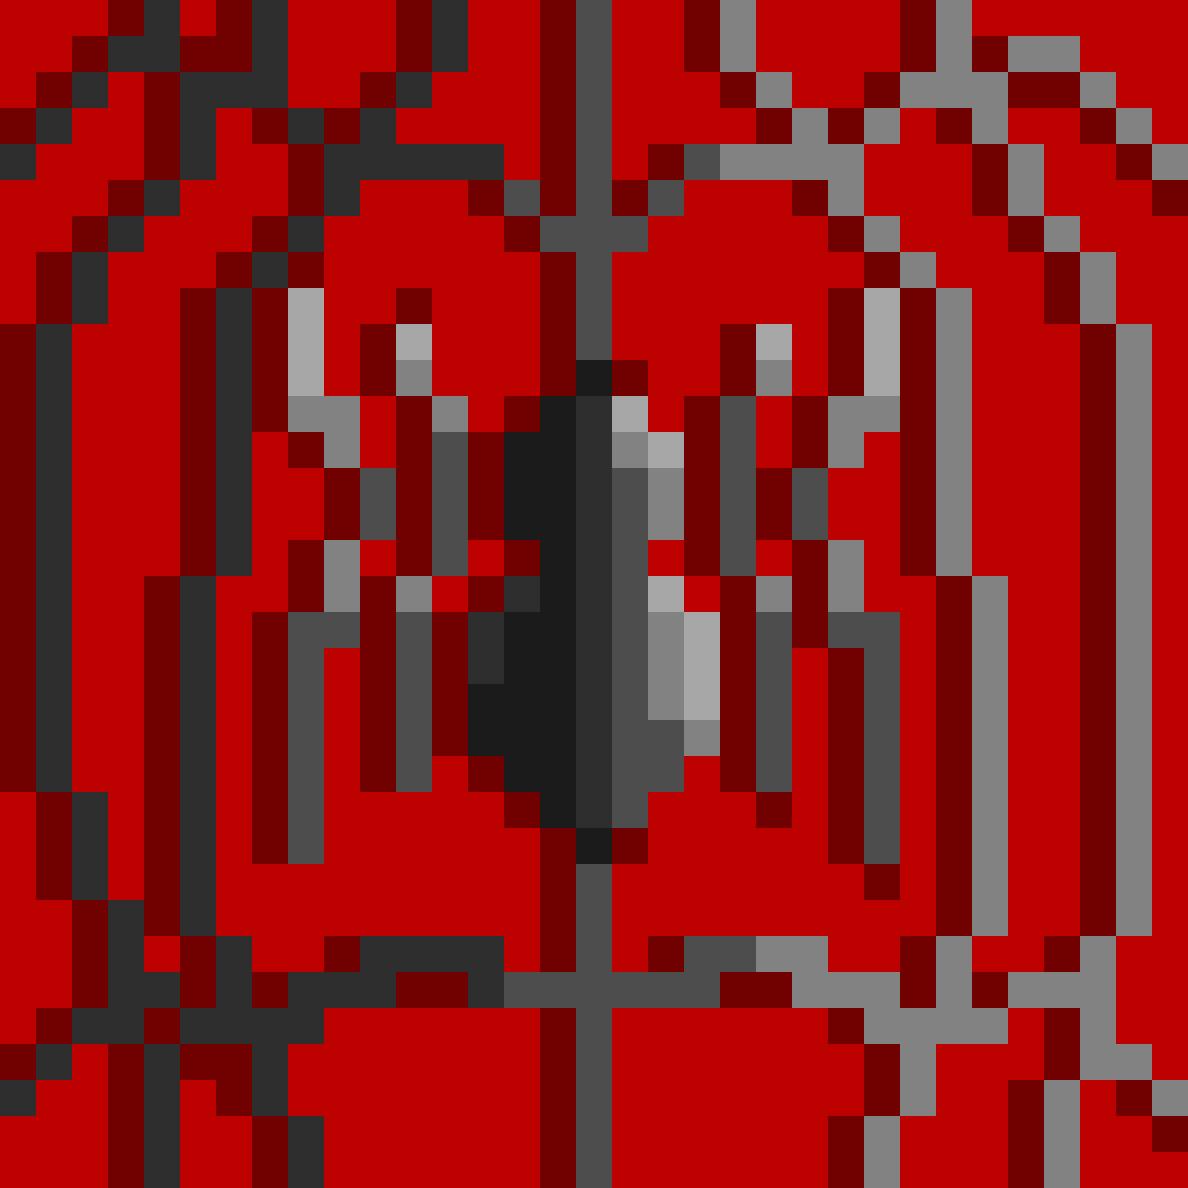 Pixilart Spider Man Symbol By Agard80 Bit